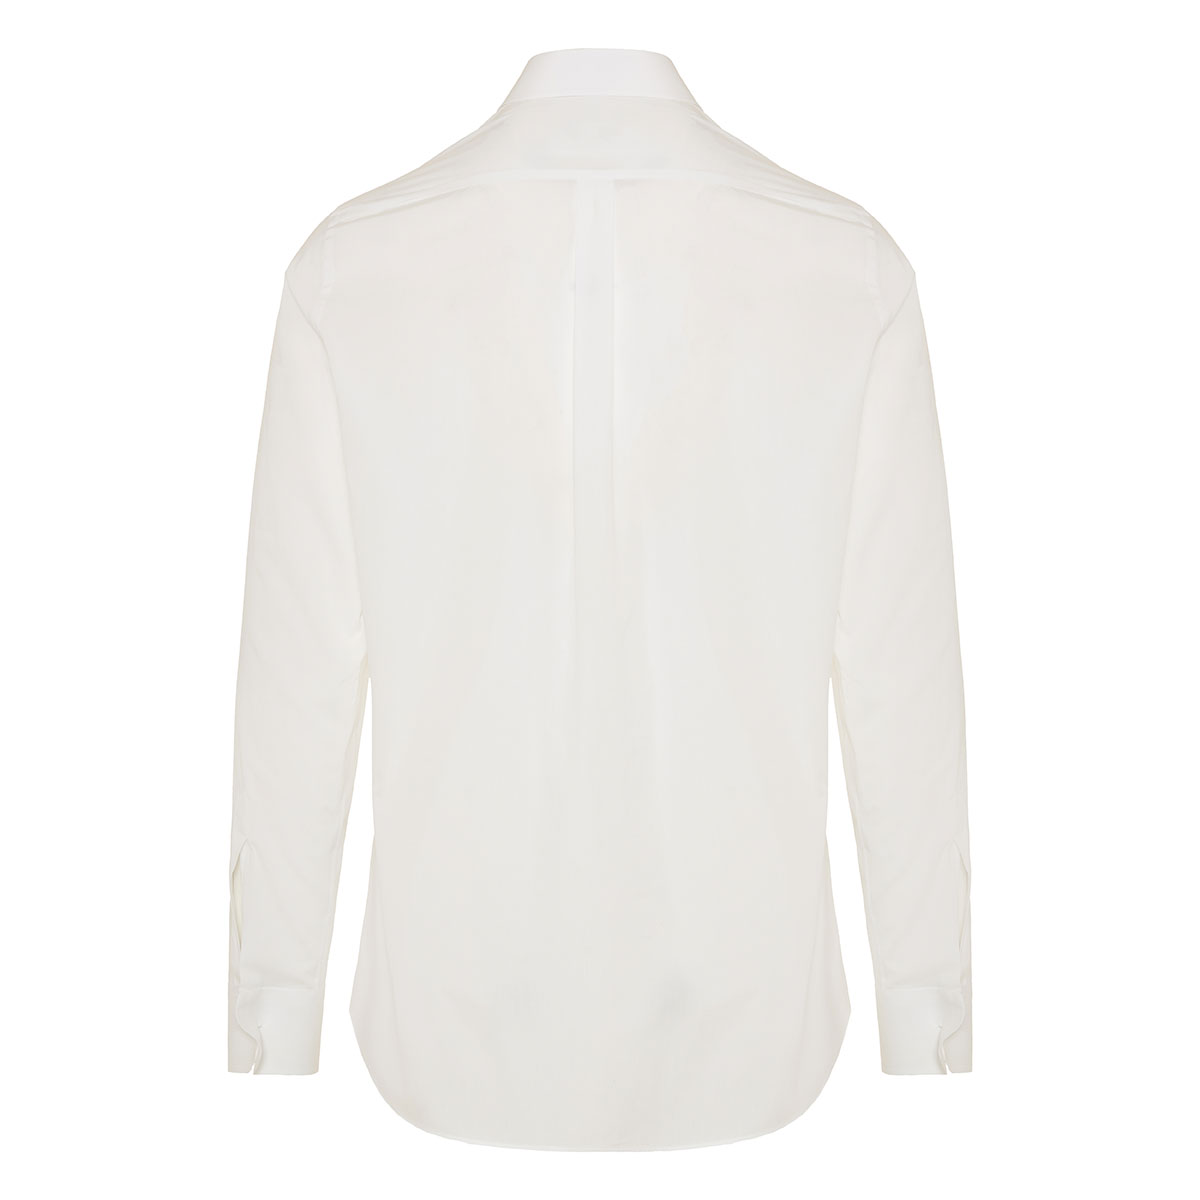 Crown-embellished shirt